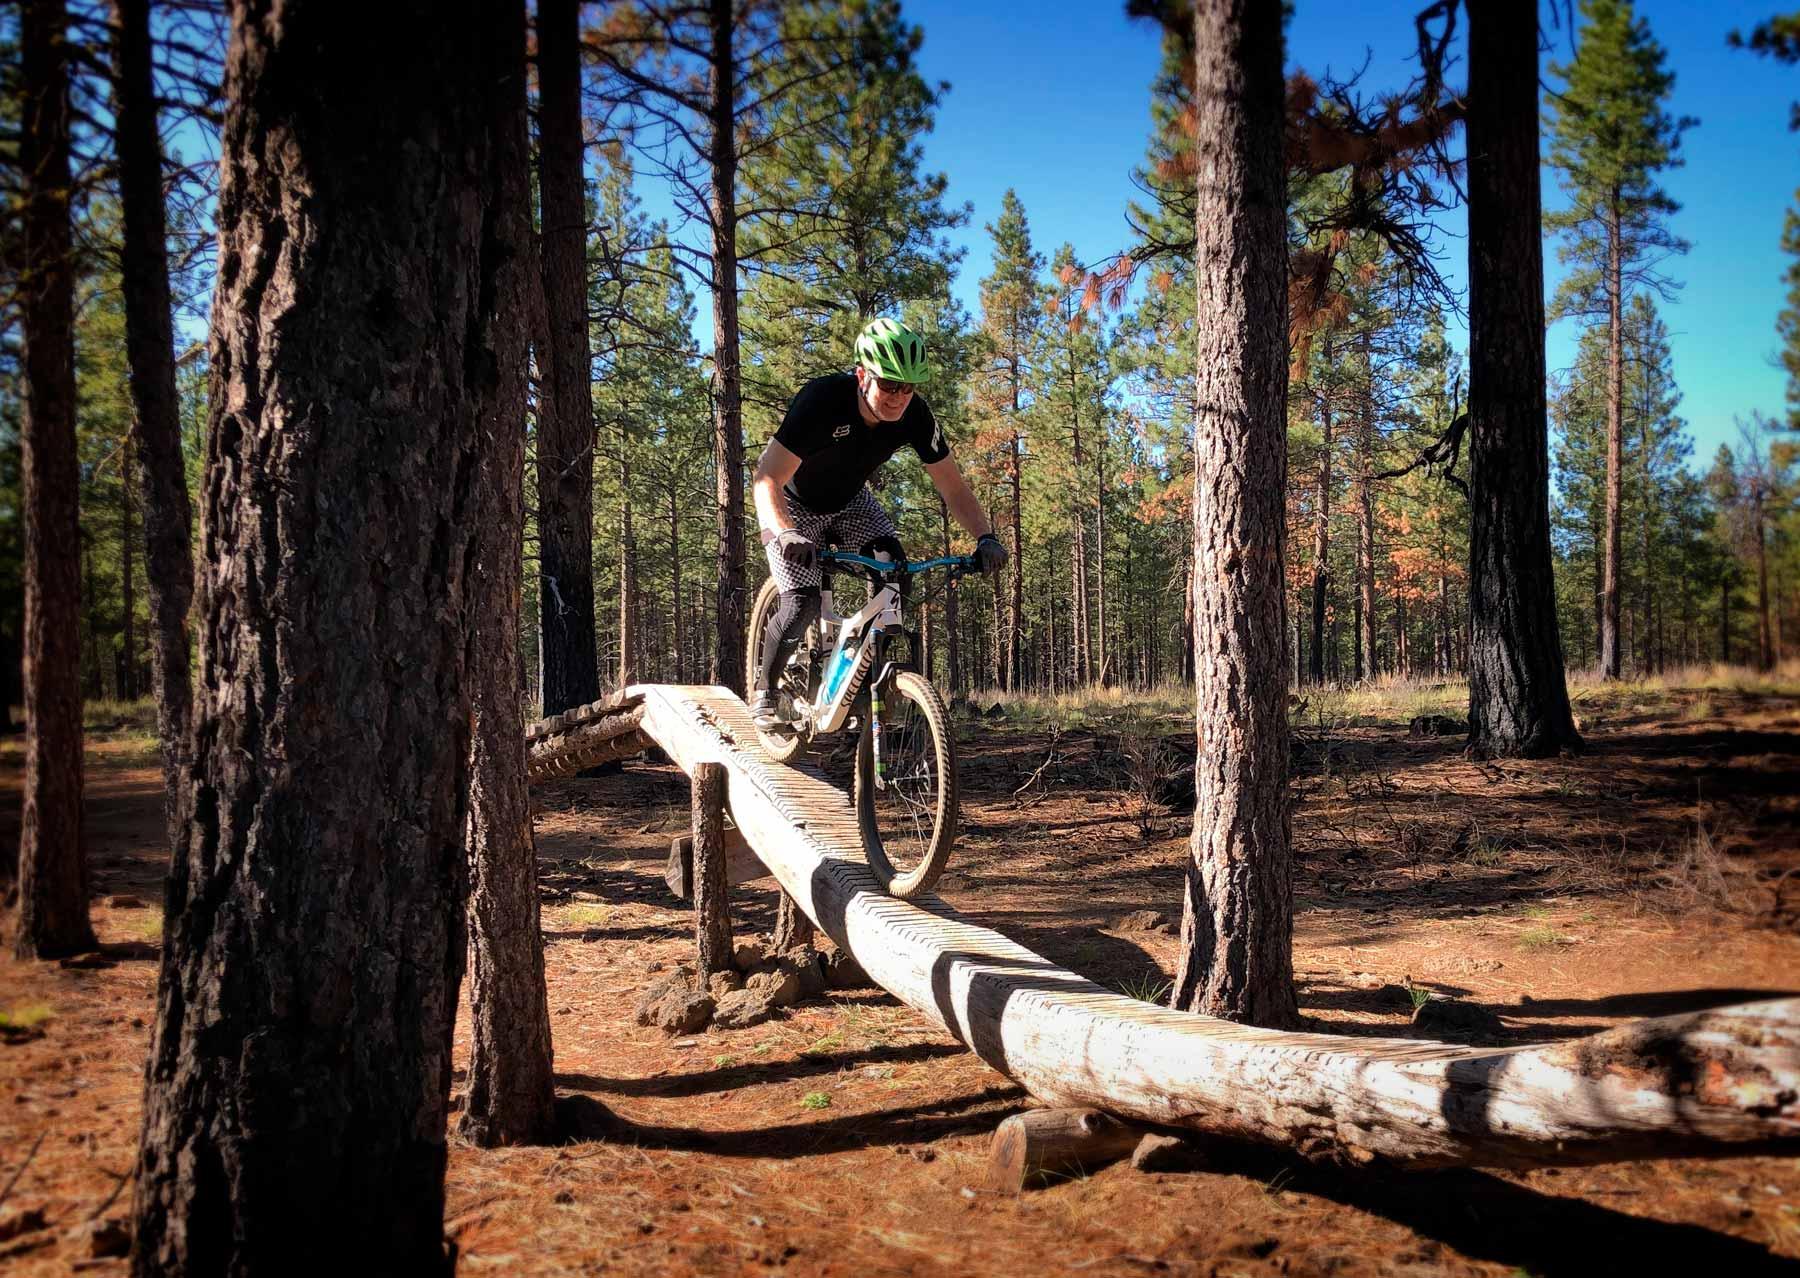 COD Trail Nessie Log Ride